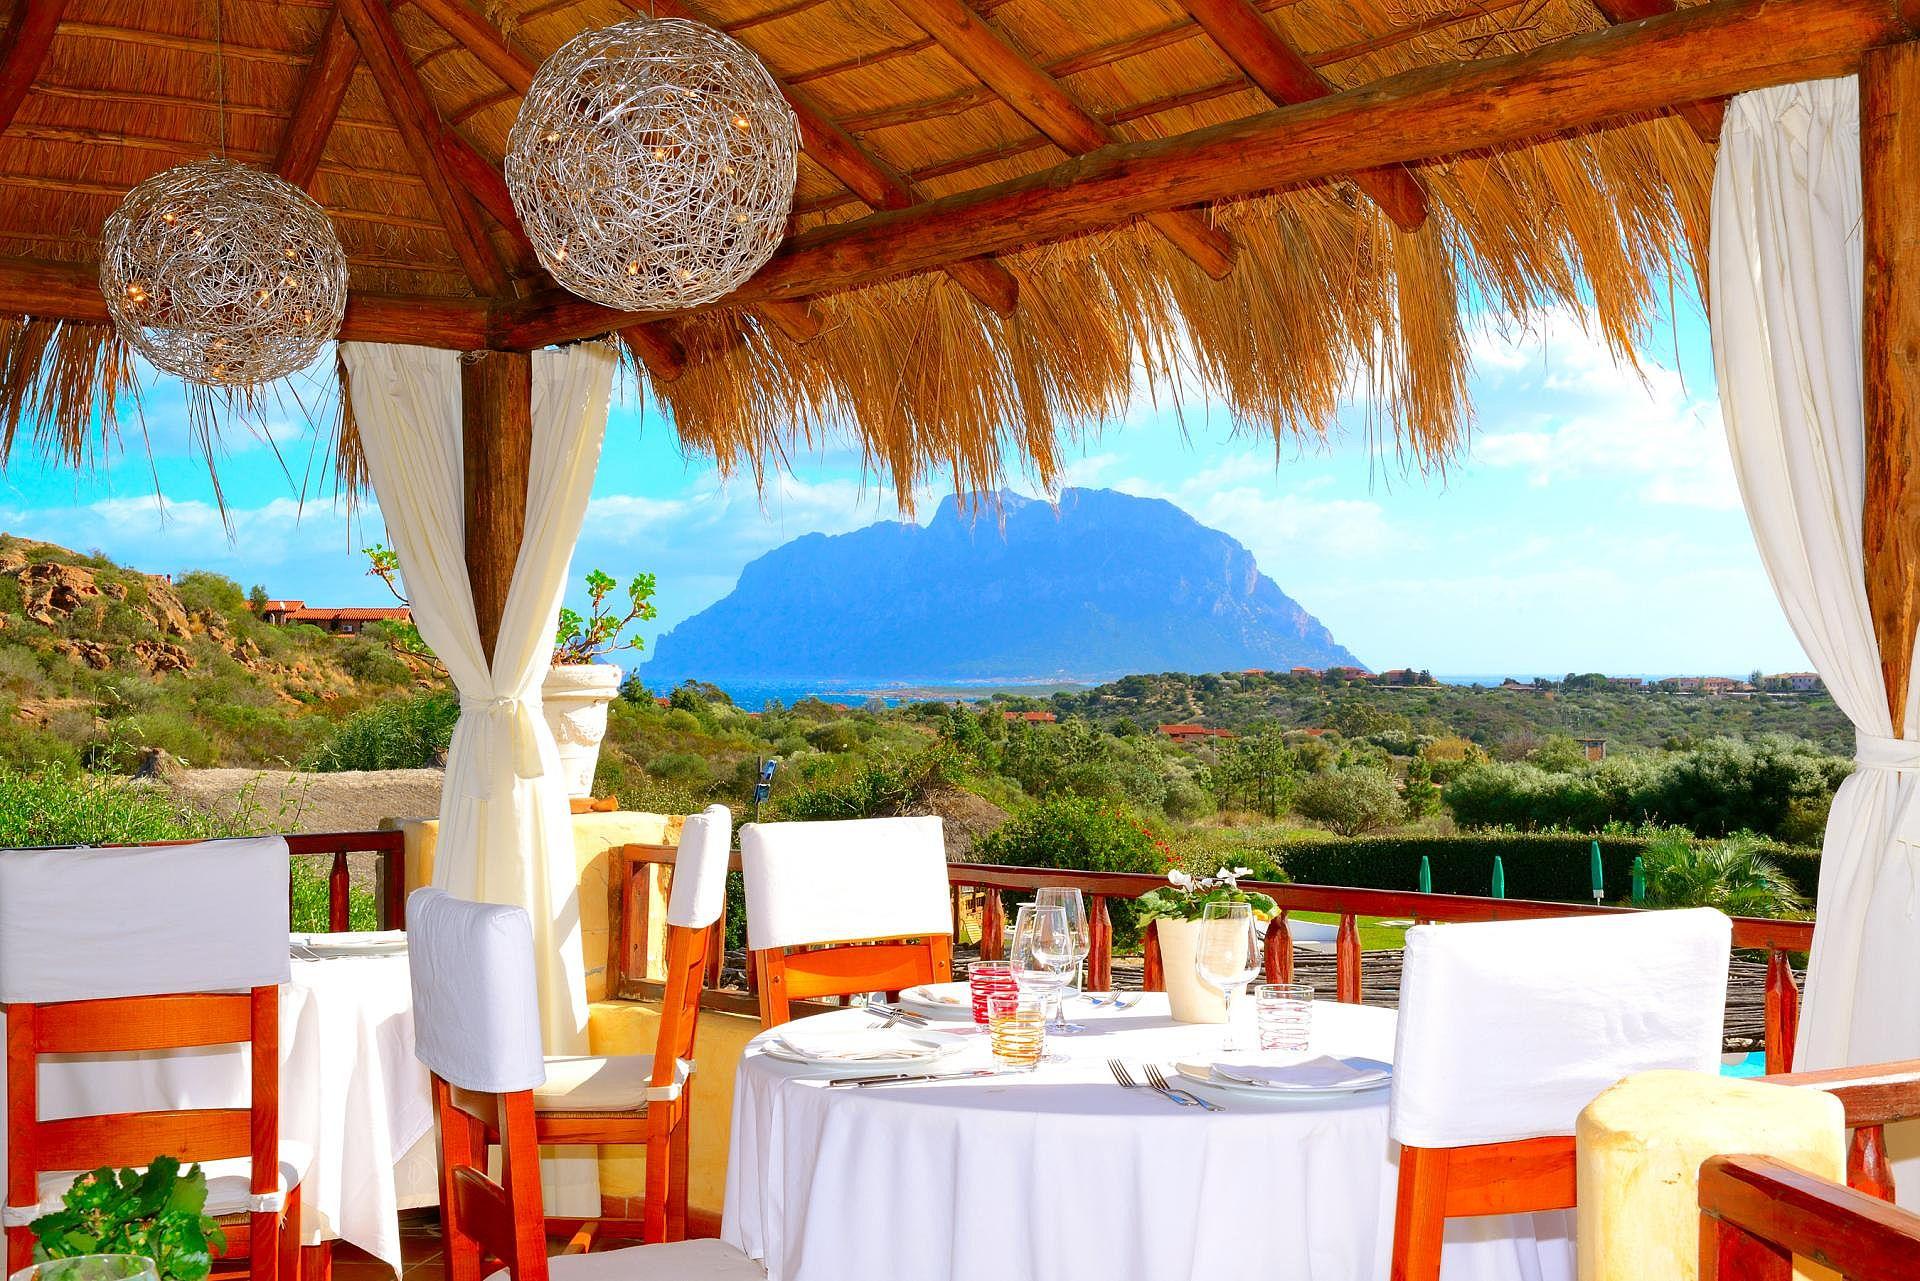 http://extranet.jetlinetravel.info/express-images/express_hotel_ollastu_residence_2.jpg